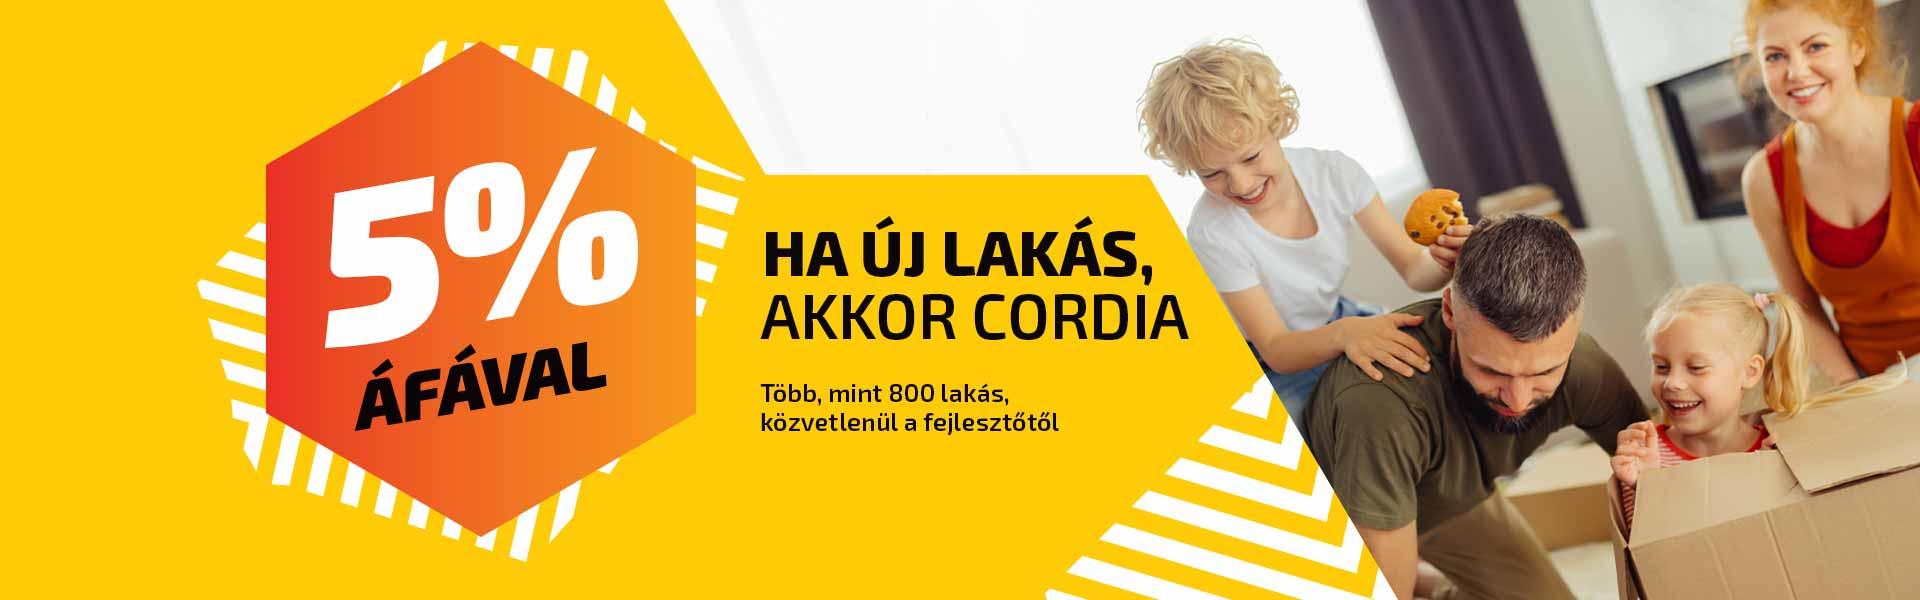 crd_5_afaval promo_header kep 1920x600_20210701